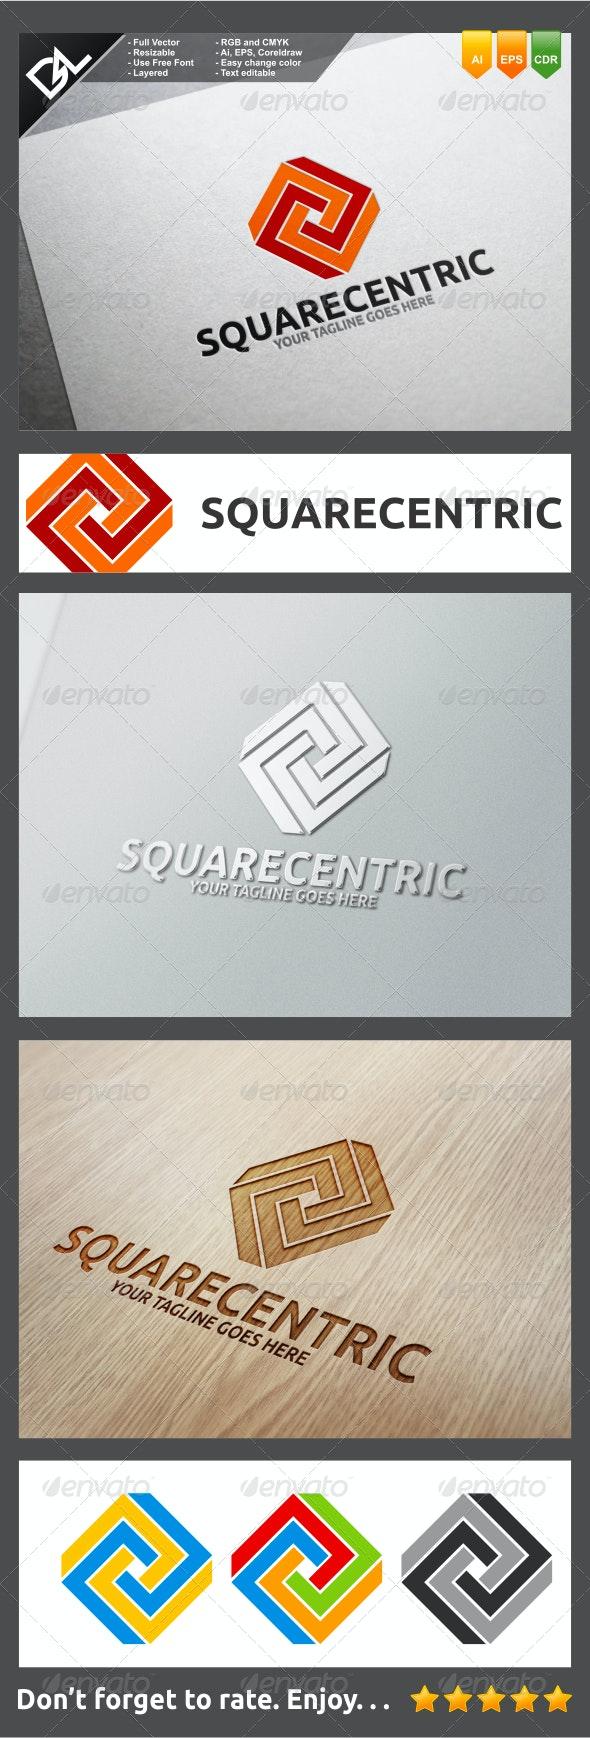 Squarecentric - Symbols Logo Templates